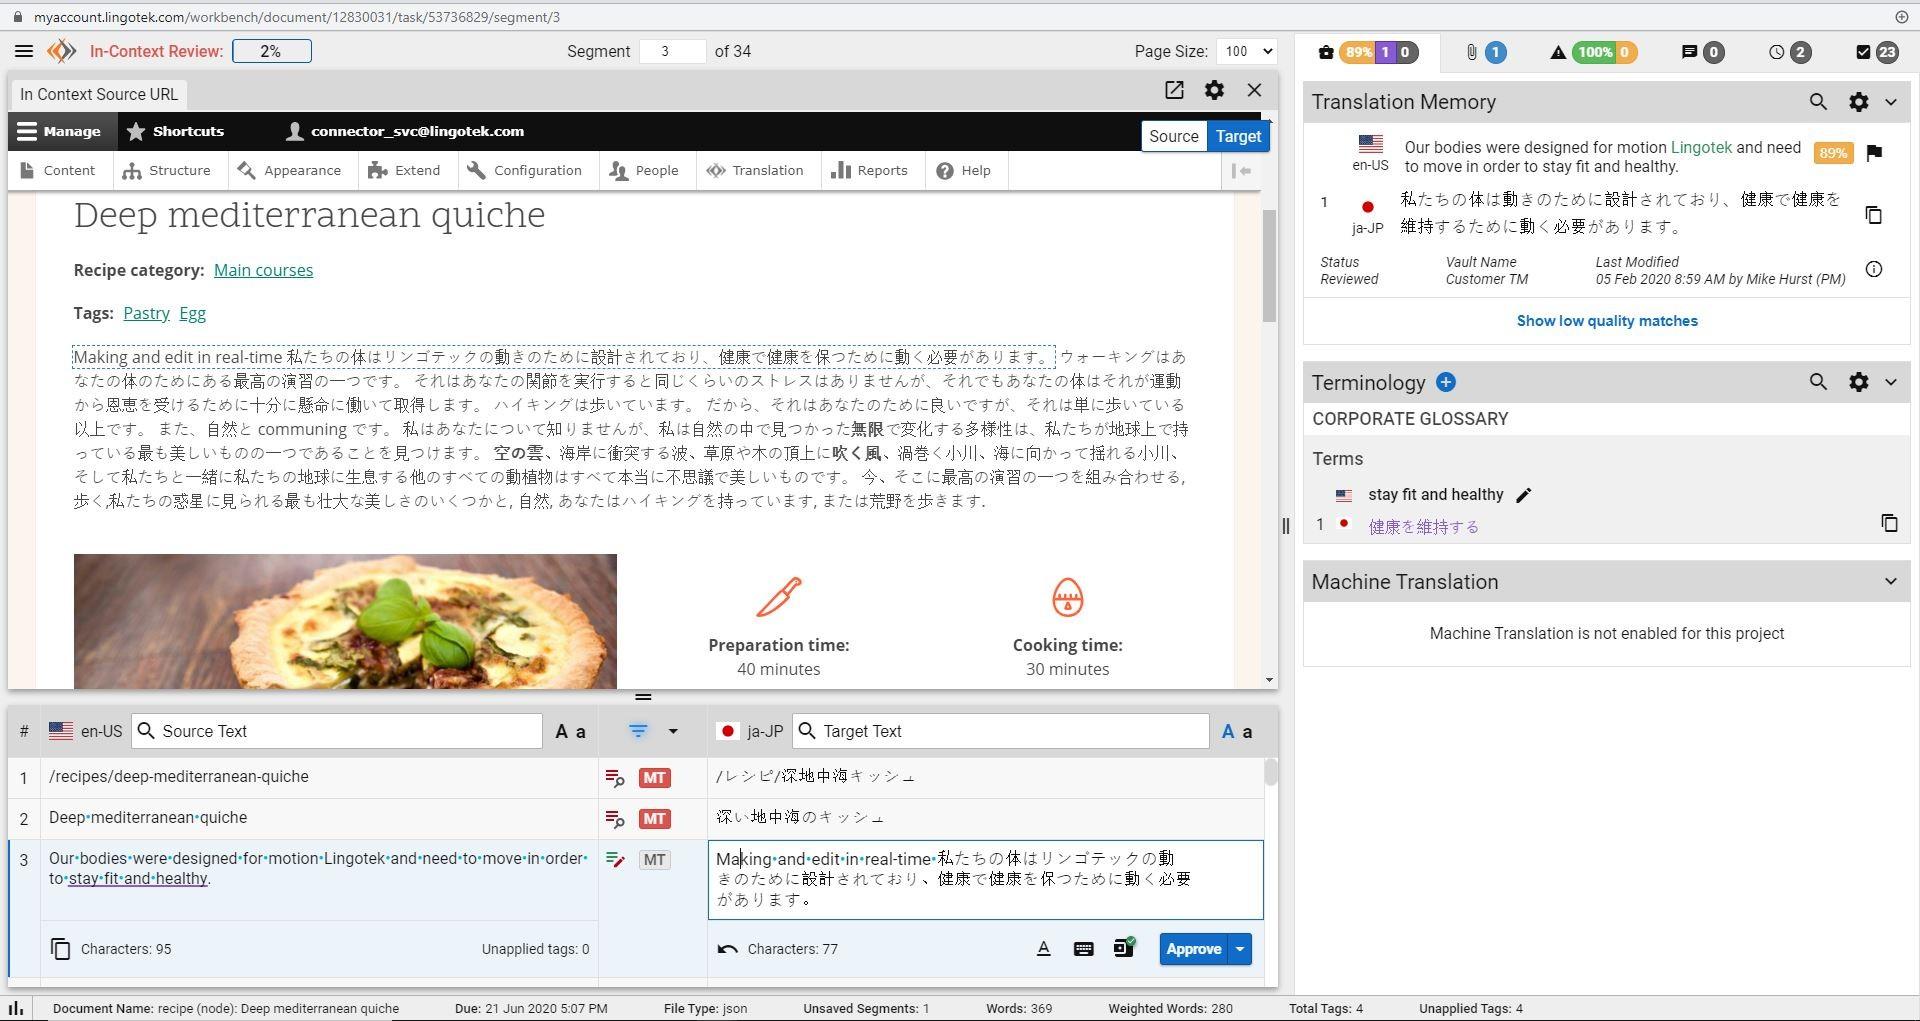 screenshot of Lingotek's in-context translation editor